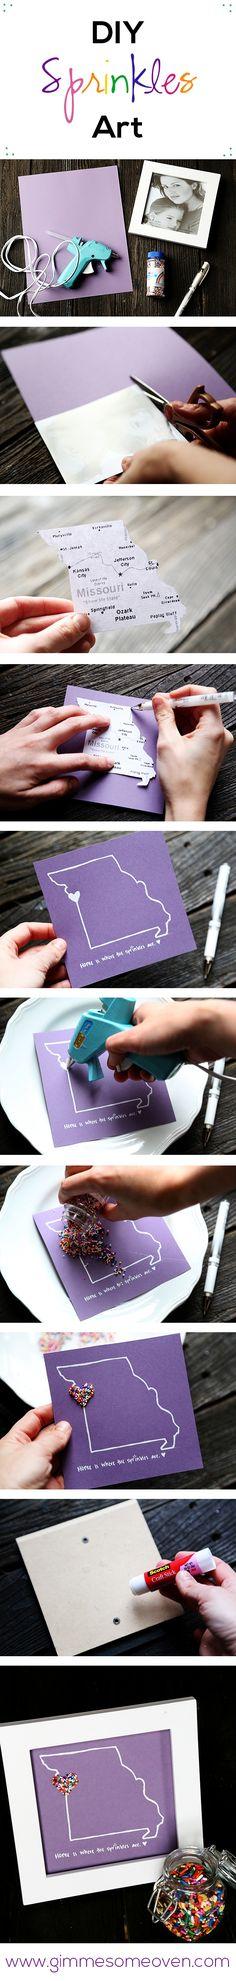 DIY Sprinkles Art (Great going away/moving gift!)